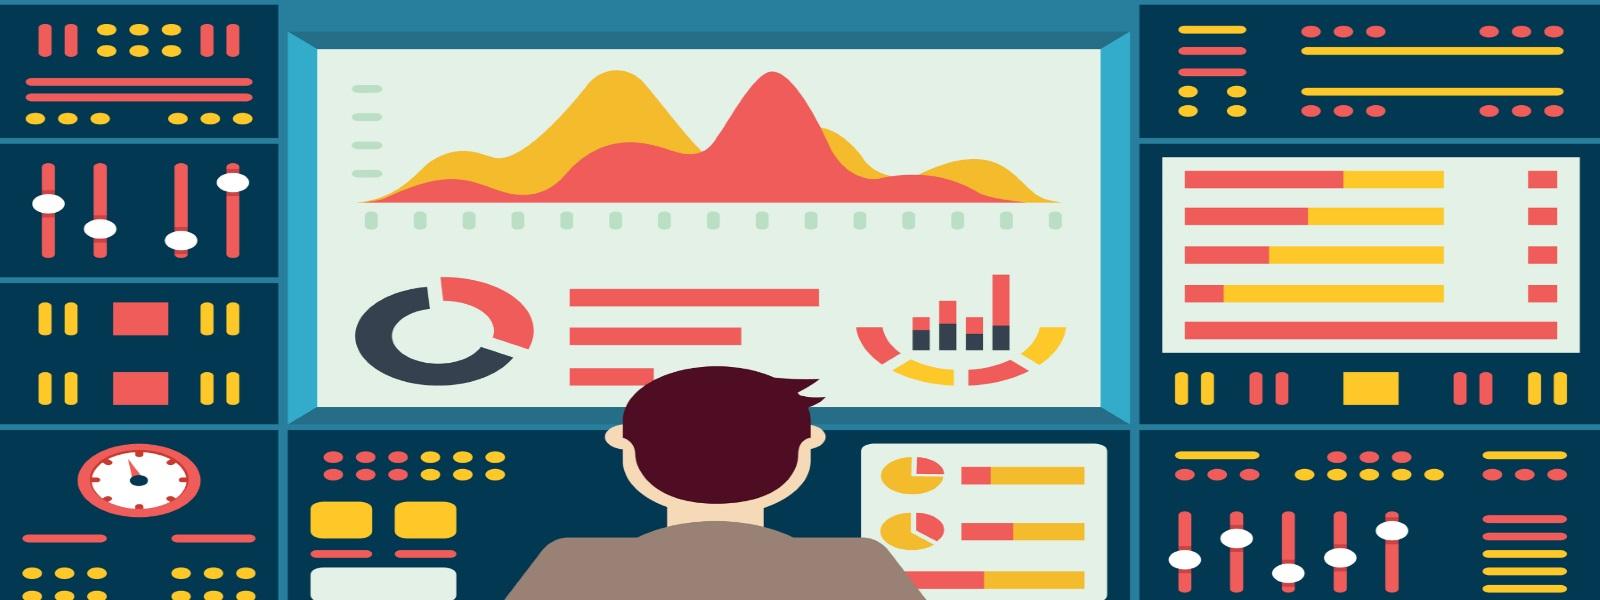 social-media-metrics2-1 A Complete Guide to Social Metrics